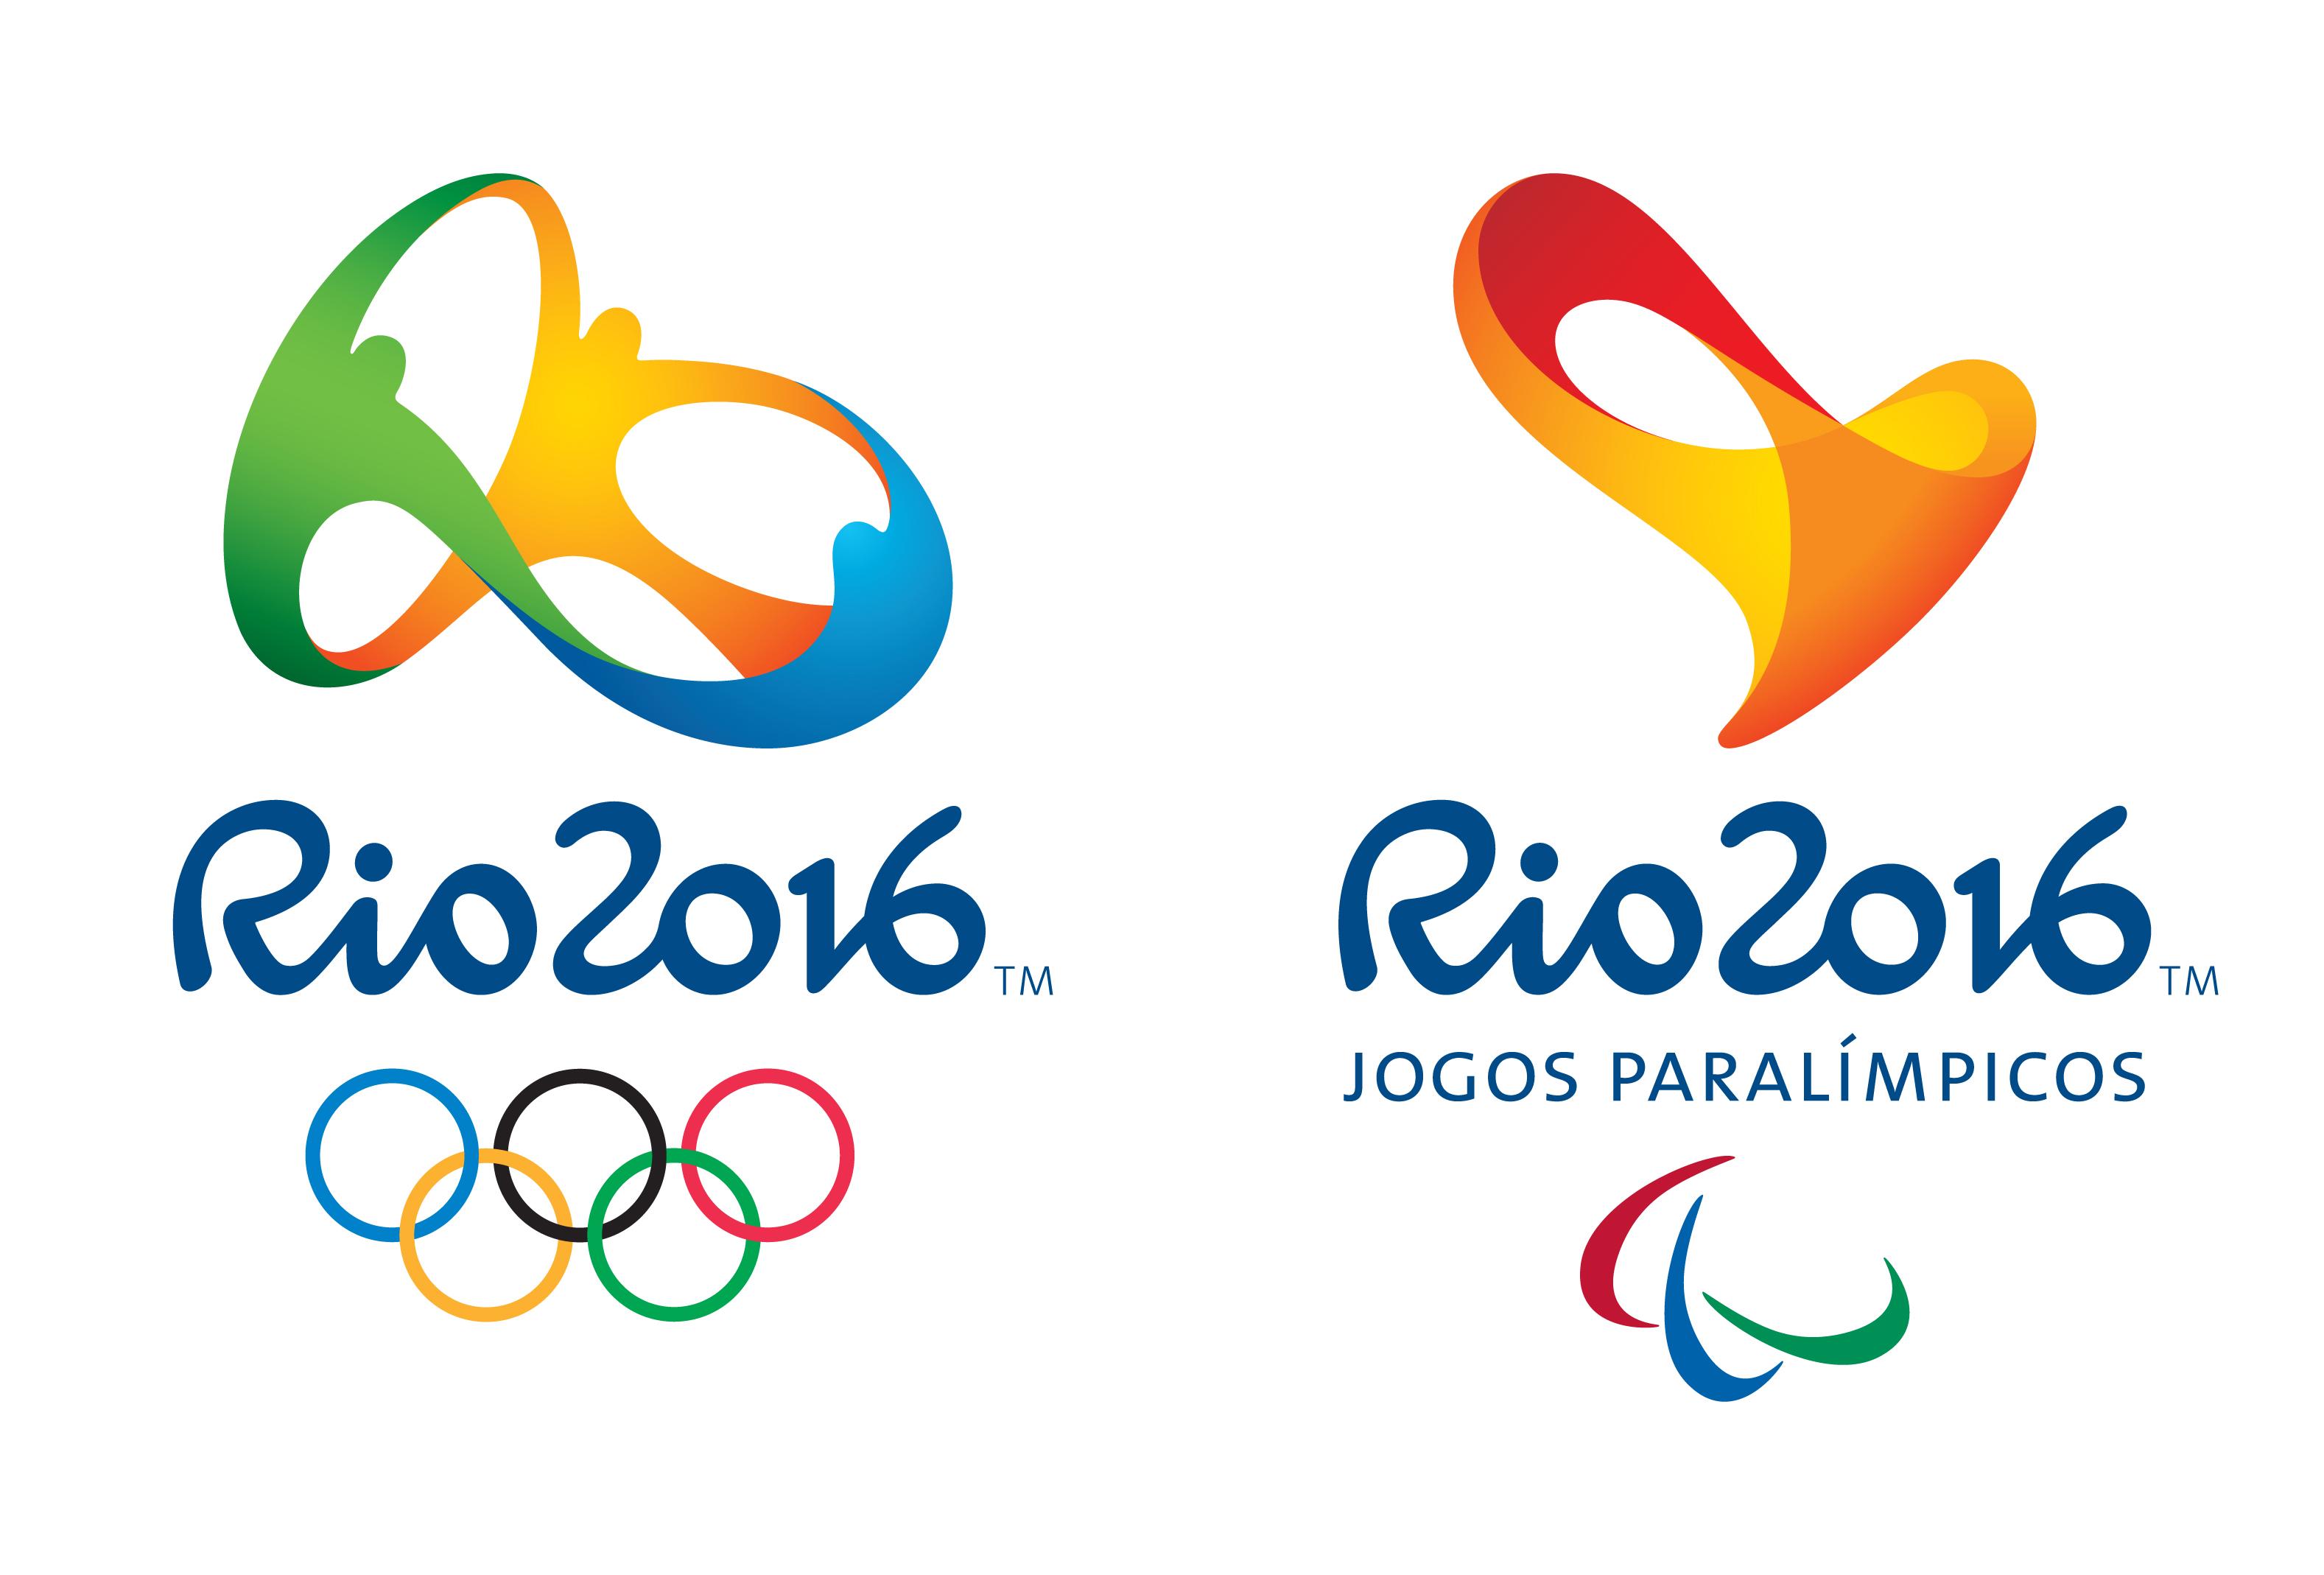 Zika: ¿Juegos Olímpicos de Río de Janeiro 2016 peligran